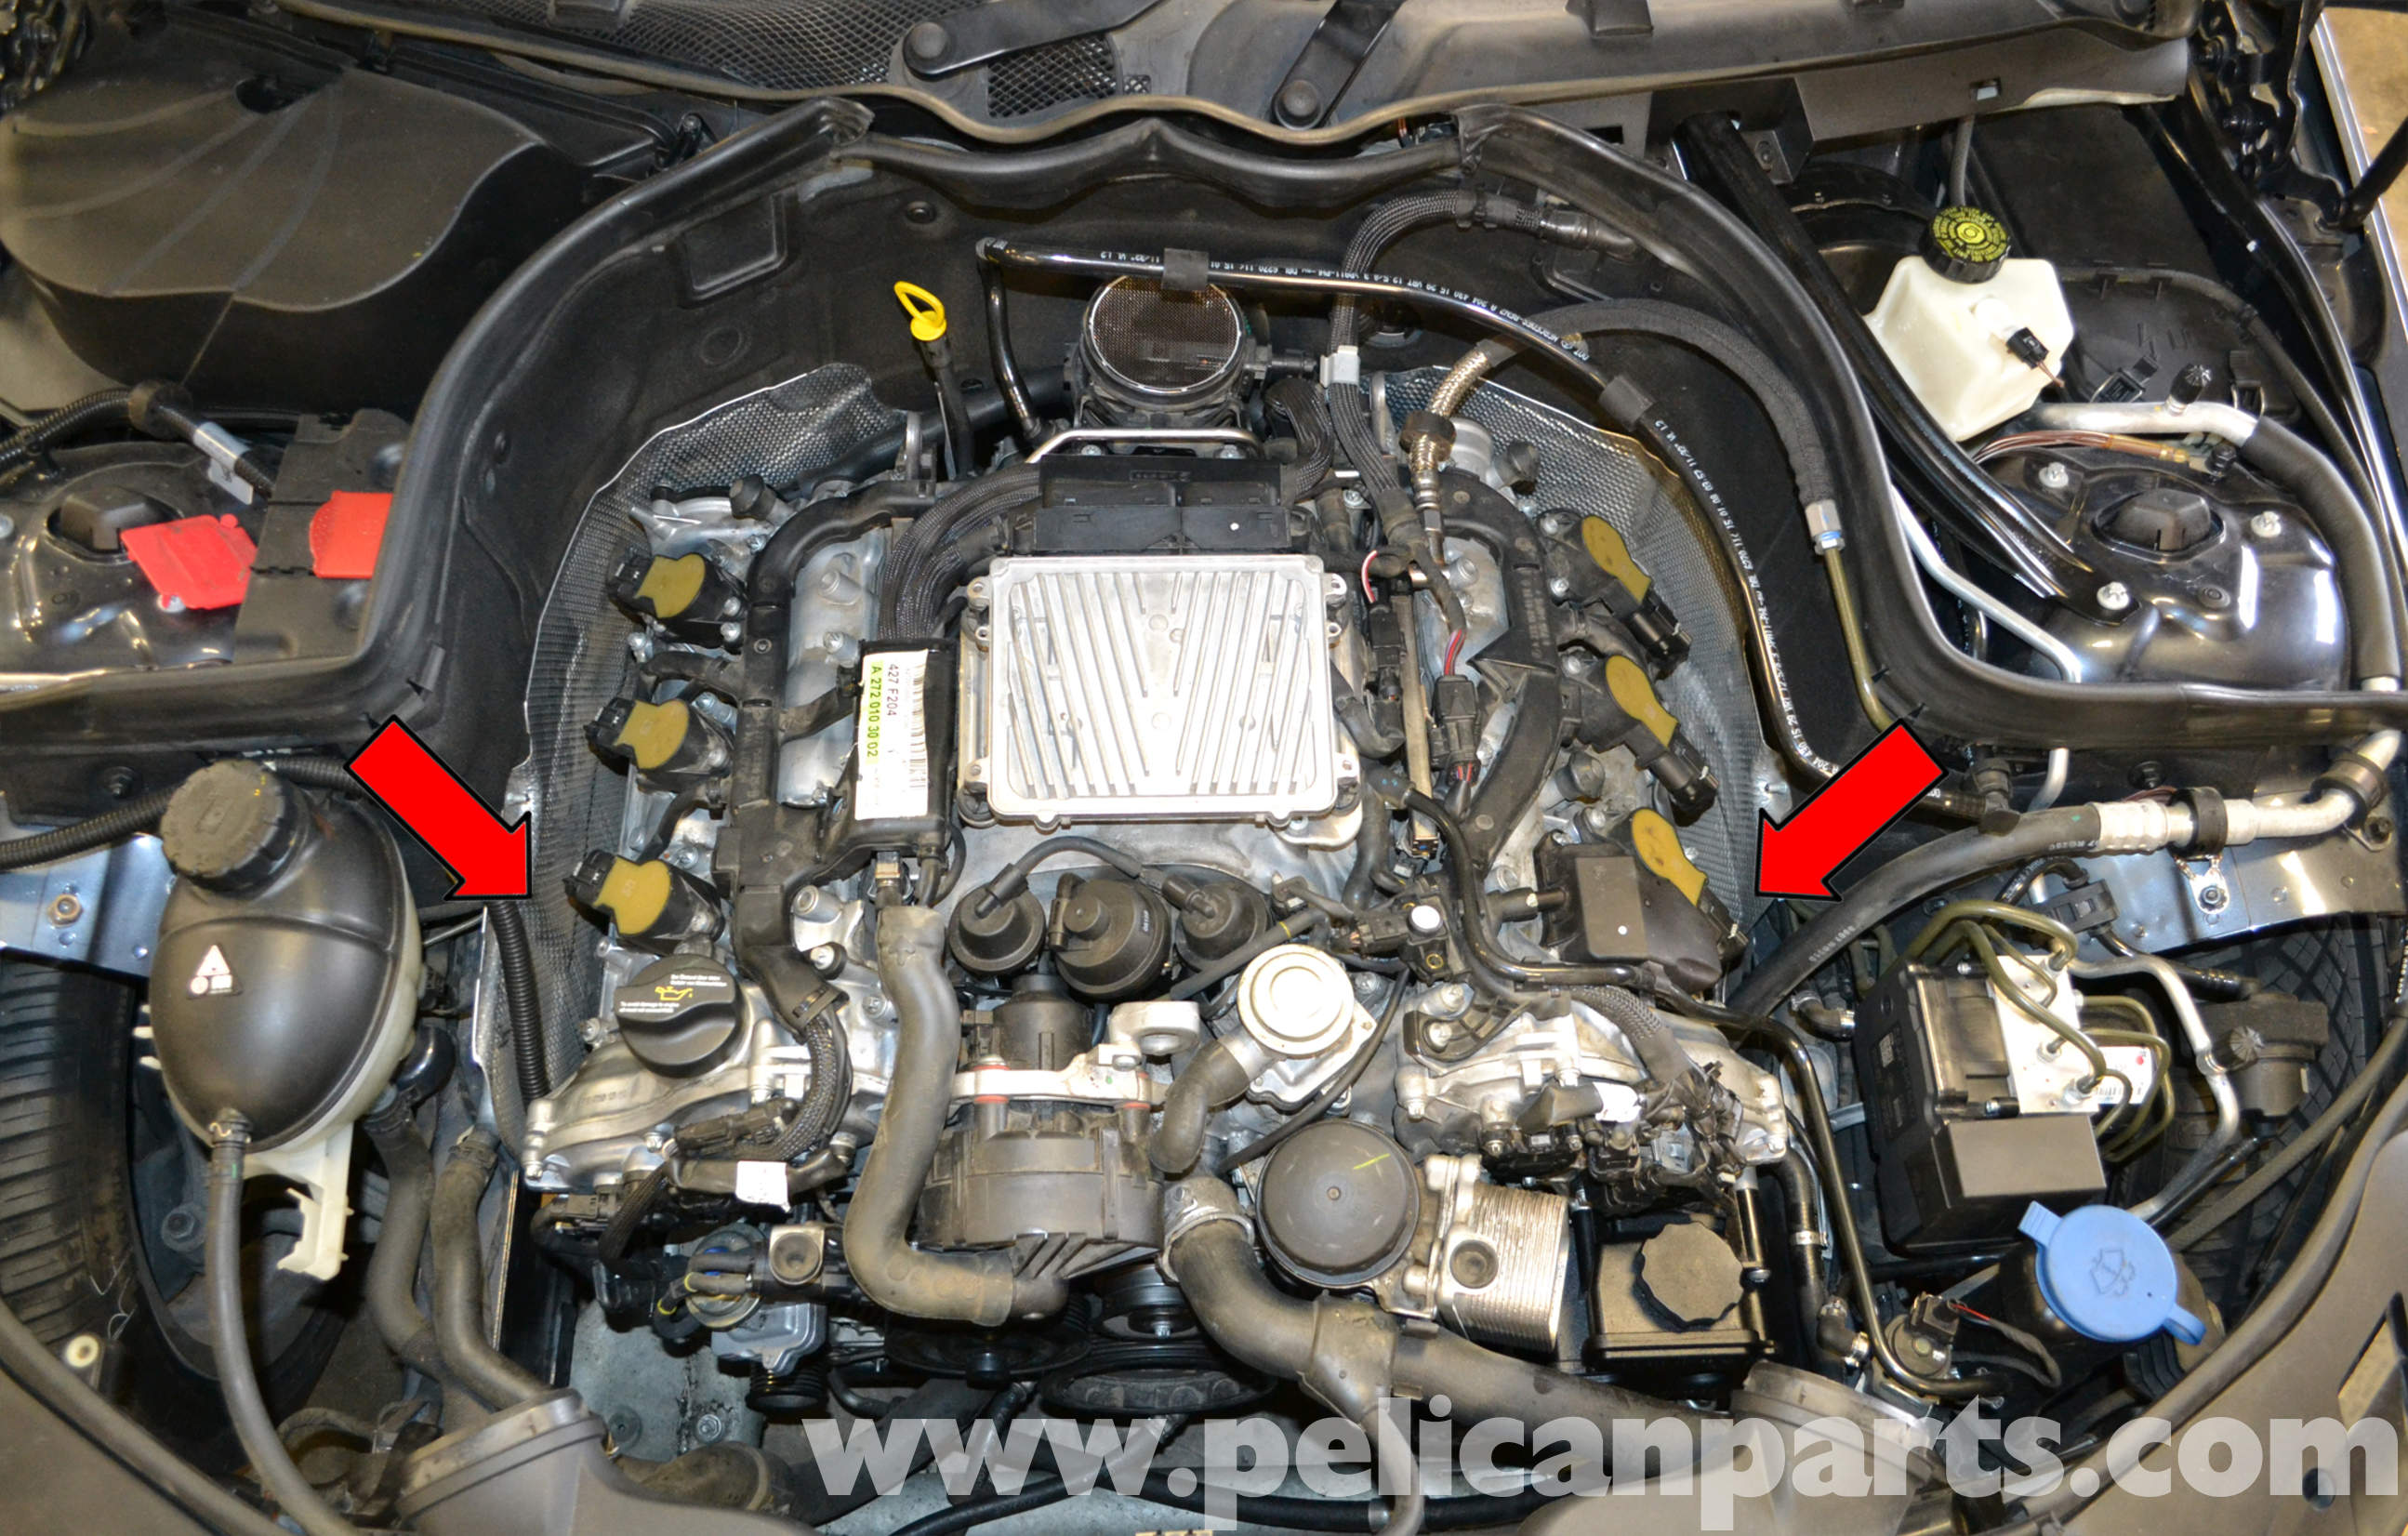 Pelican Technical Article - Mercedes-Benz W204 - Engine Mount